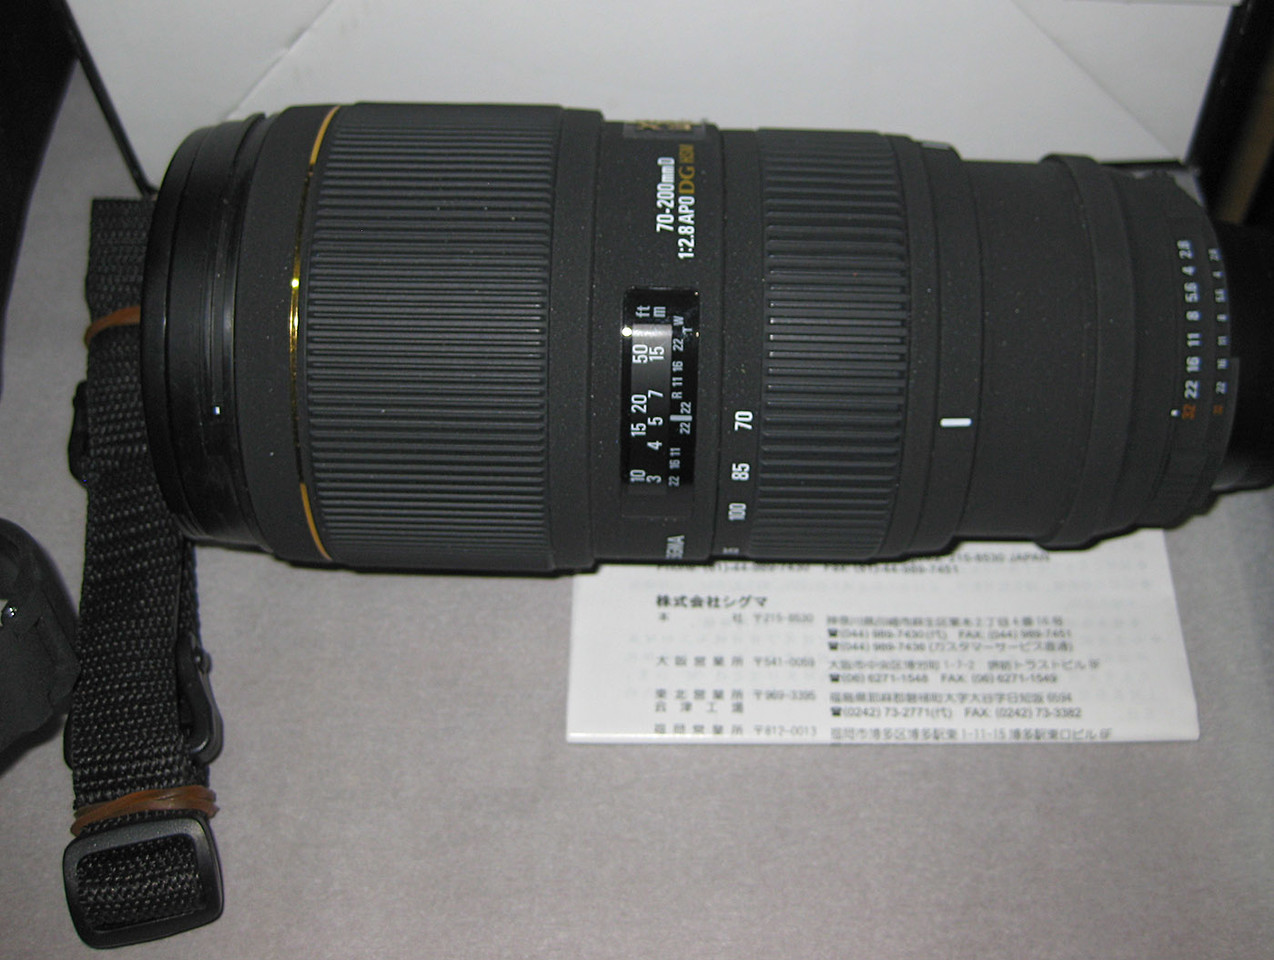 i-GhqSfTc-X2.jpg